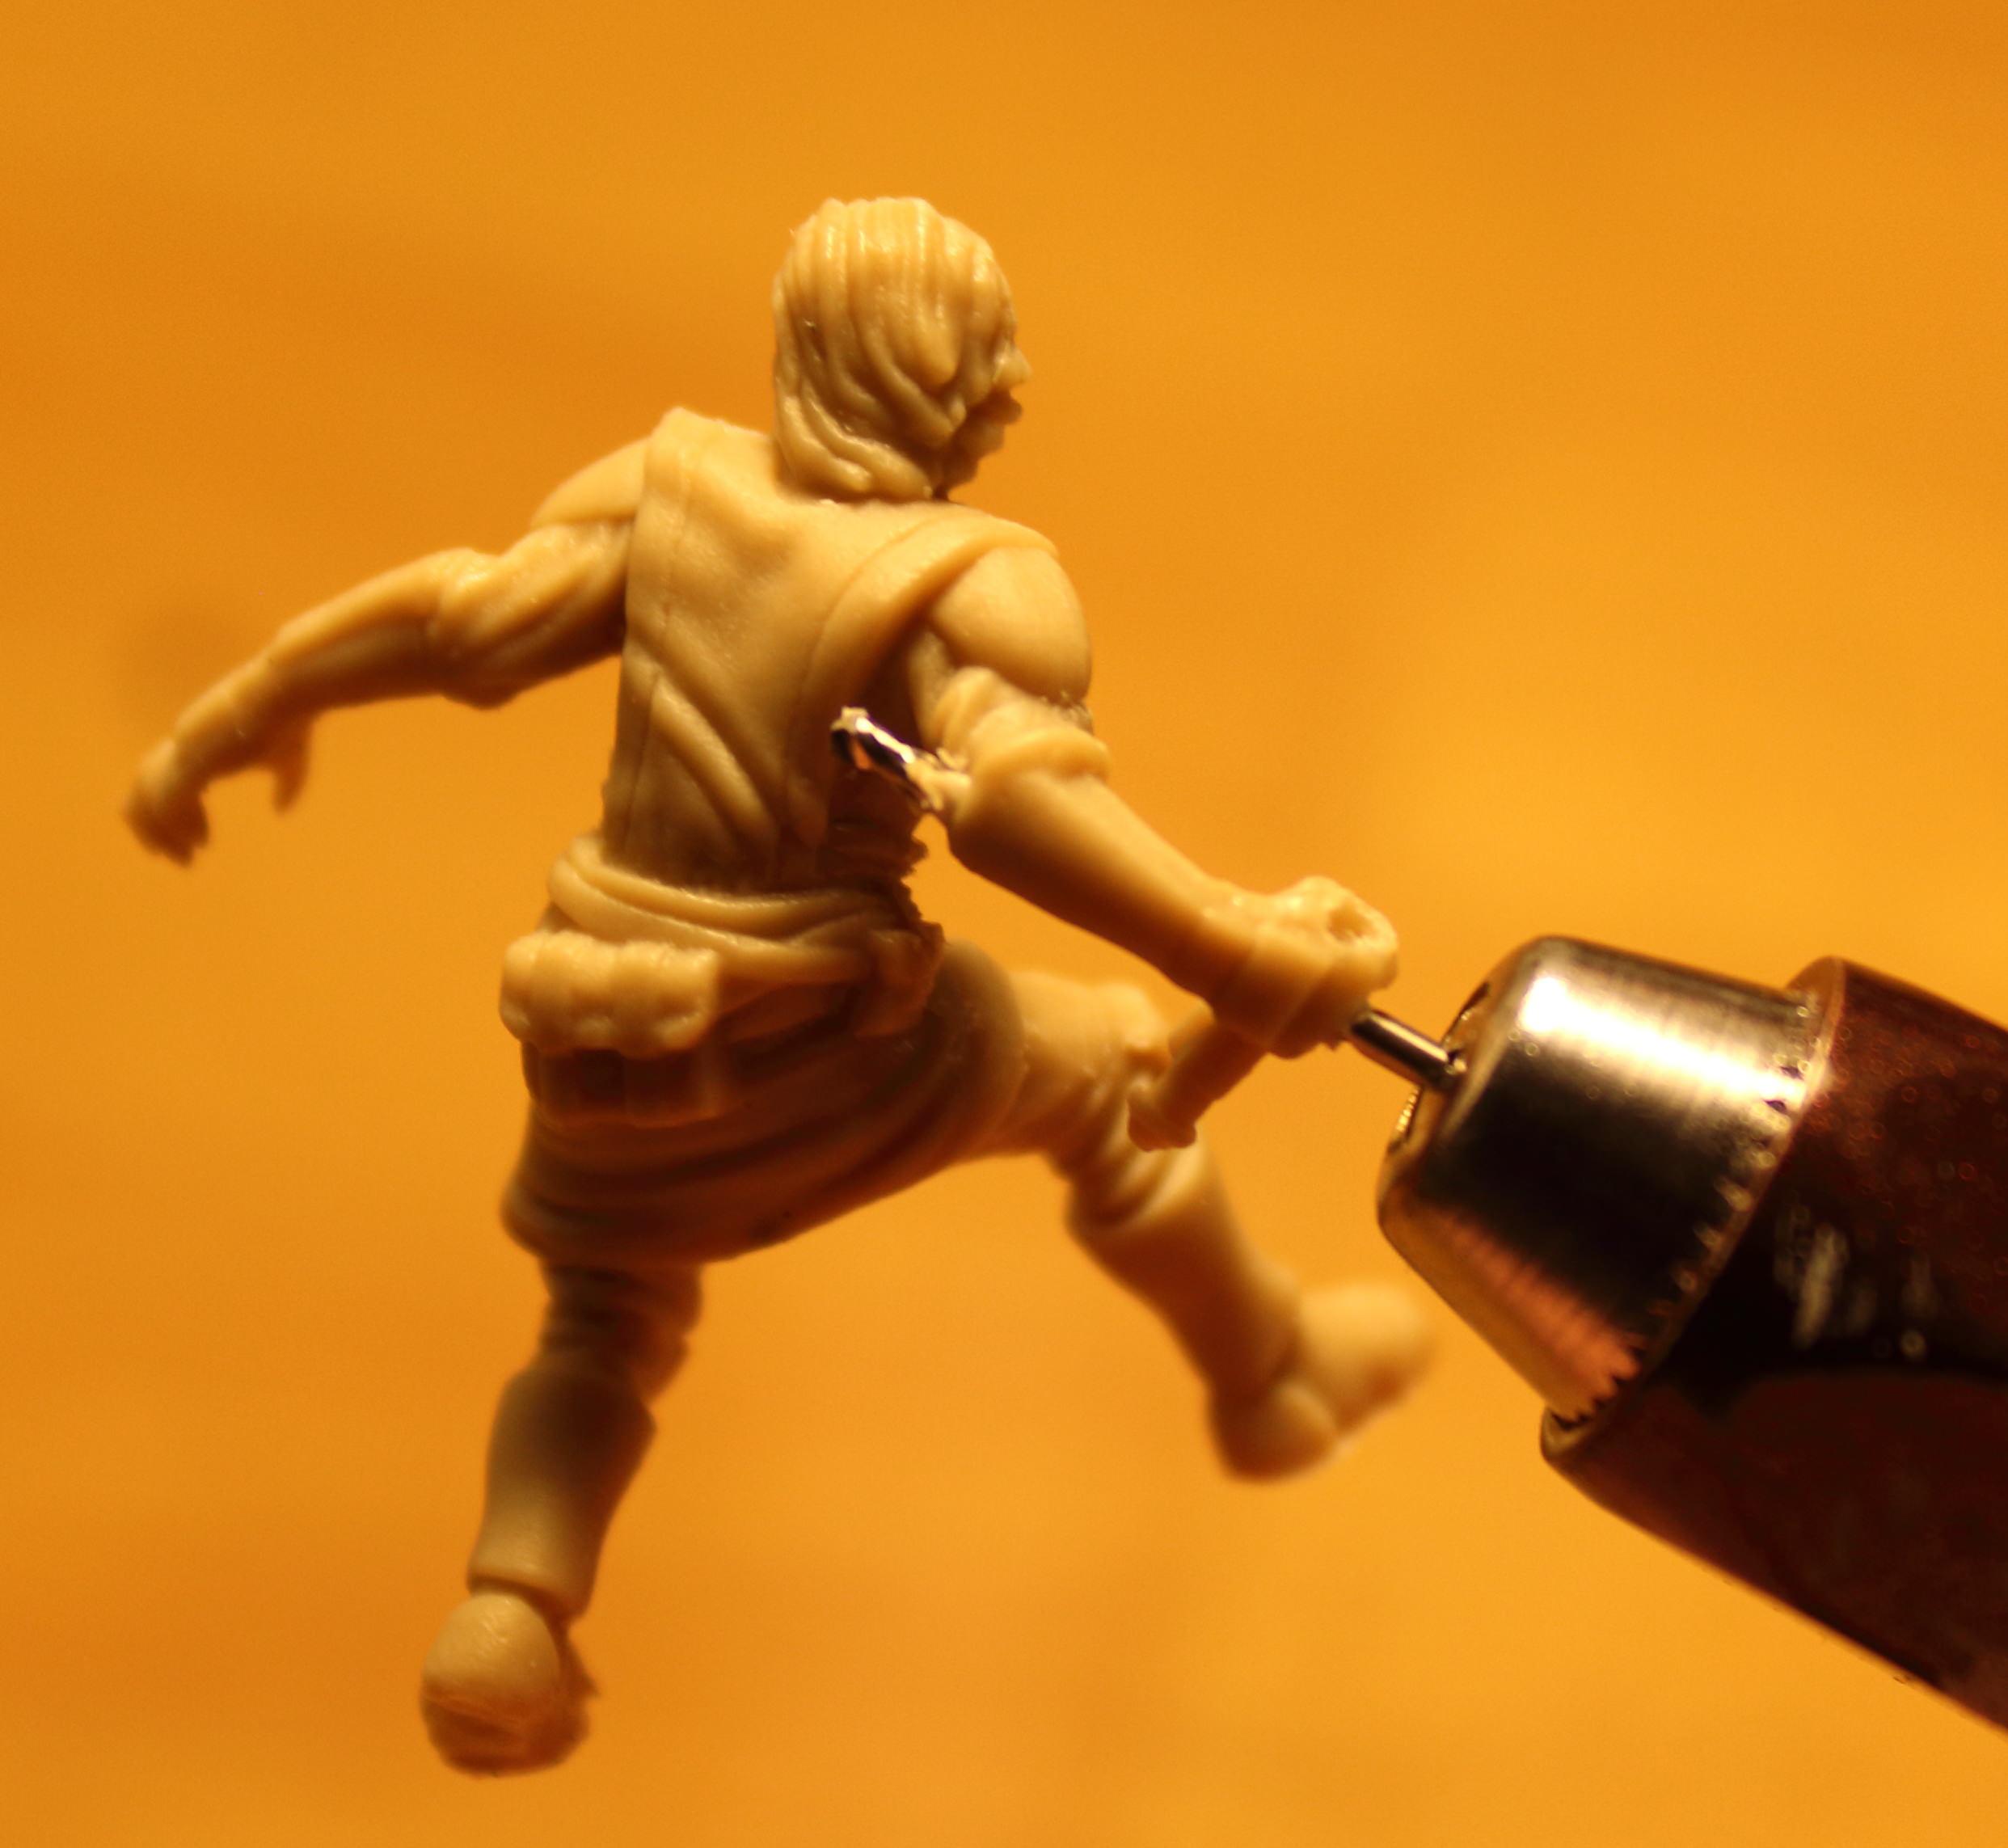 Imperial_Assault_Board_Game_LED_lightsaber_miniature_05.jpg